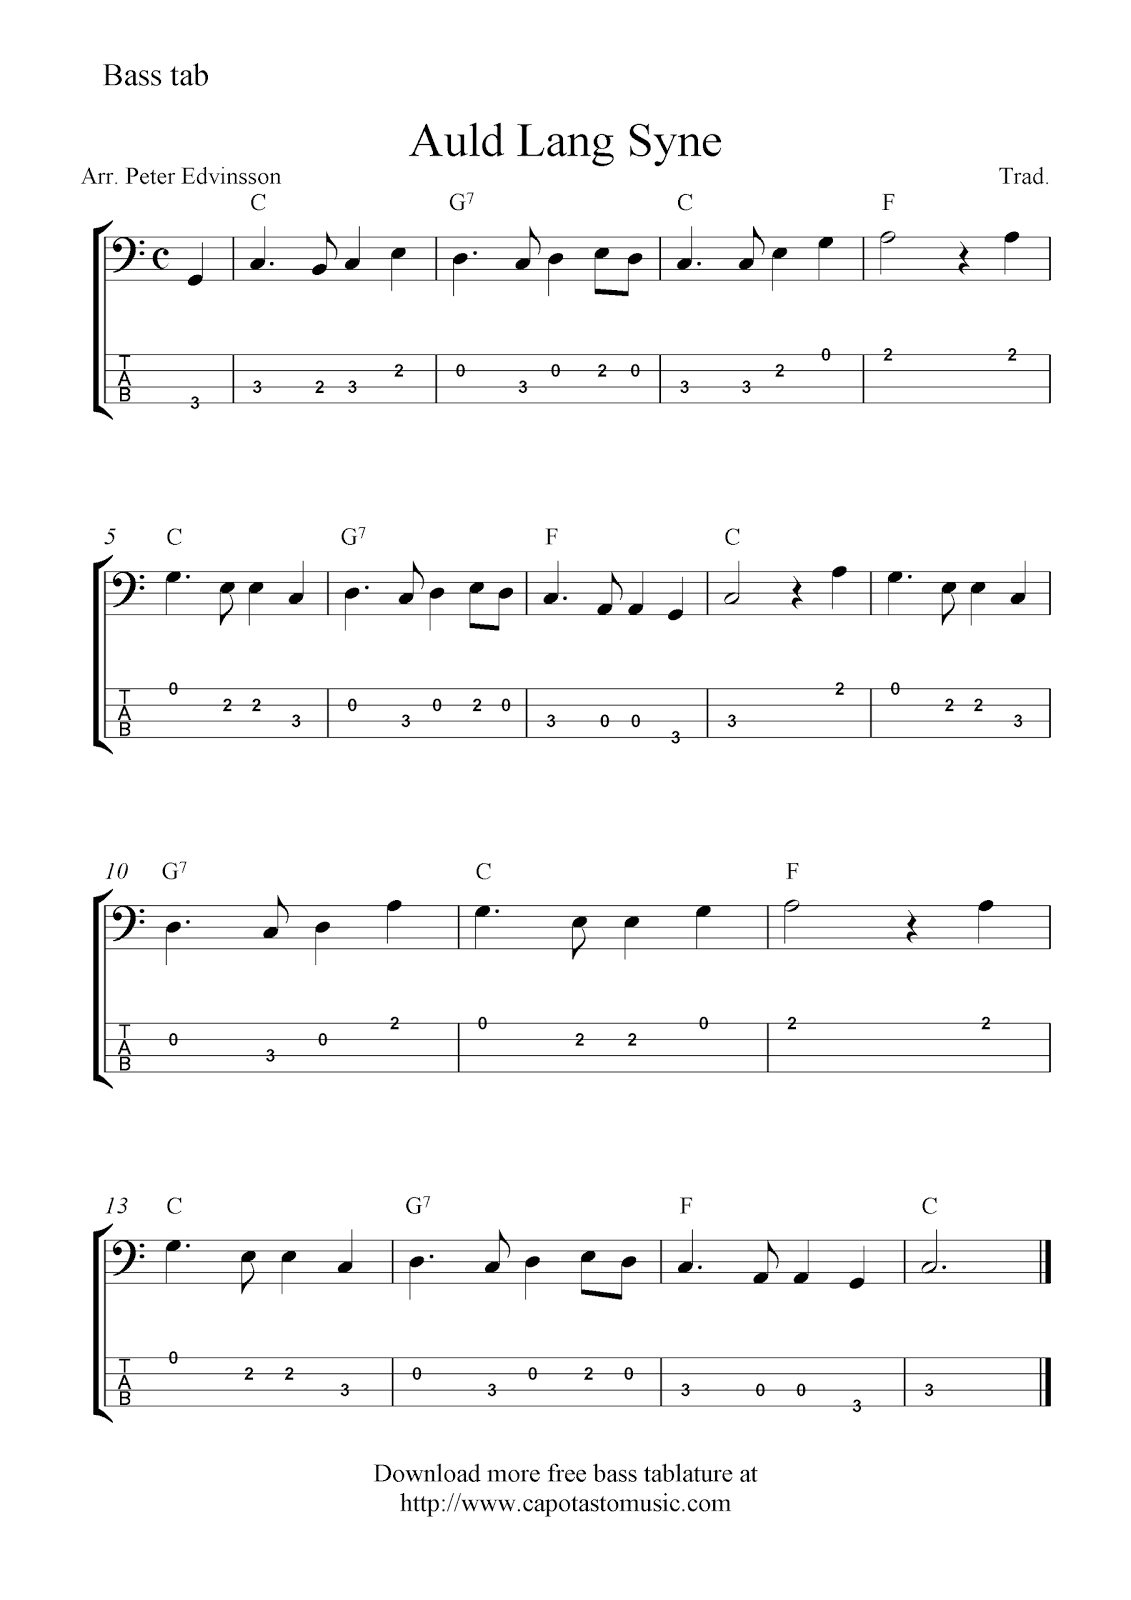 Free Easy Bass Guitar Tab Sheet Music Auld Lang Syne